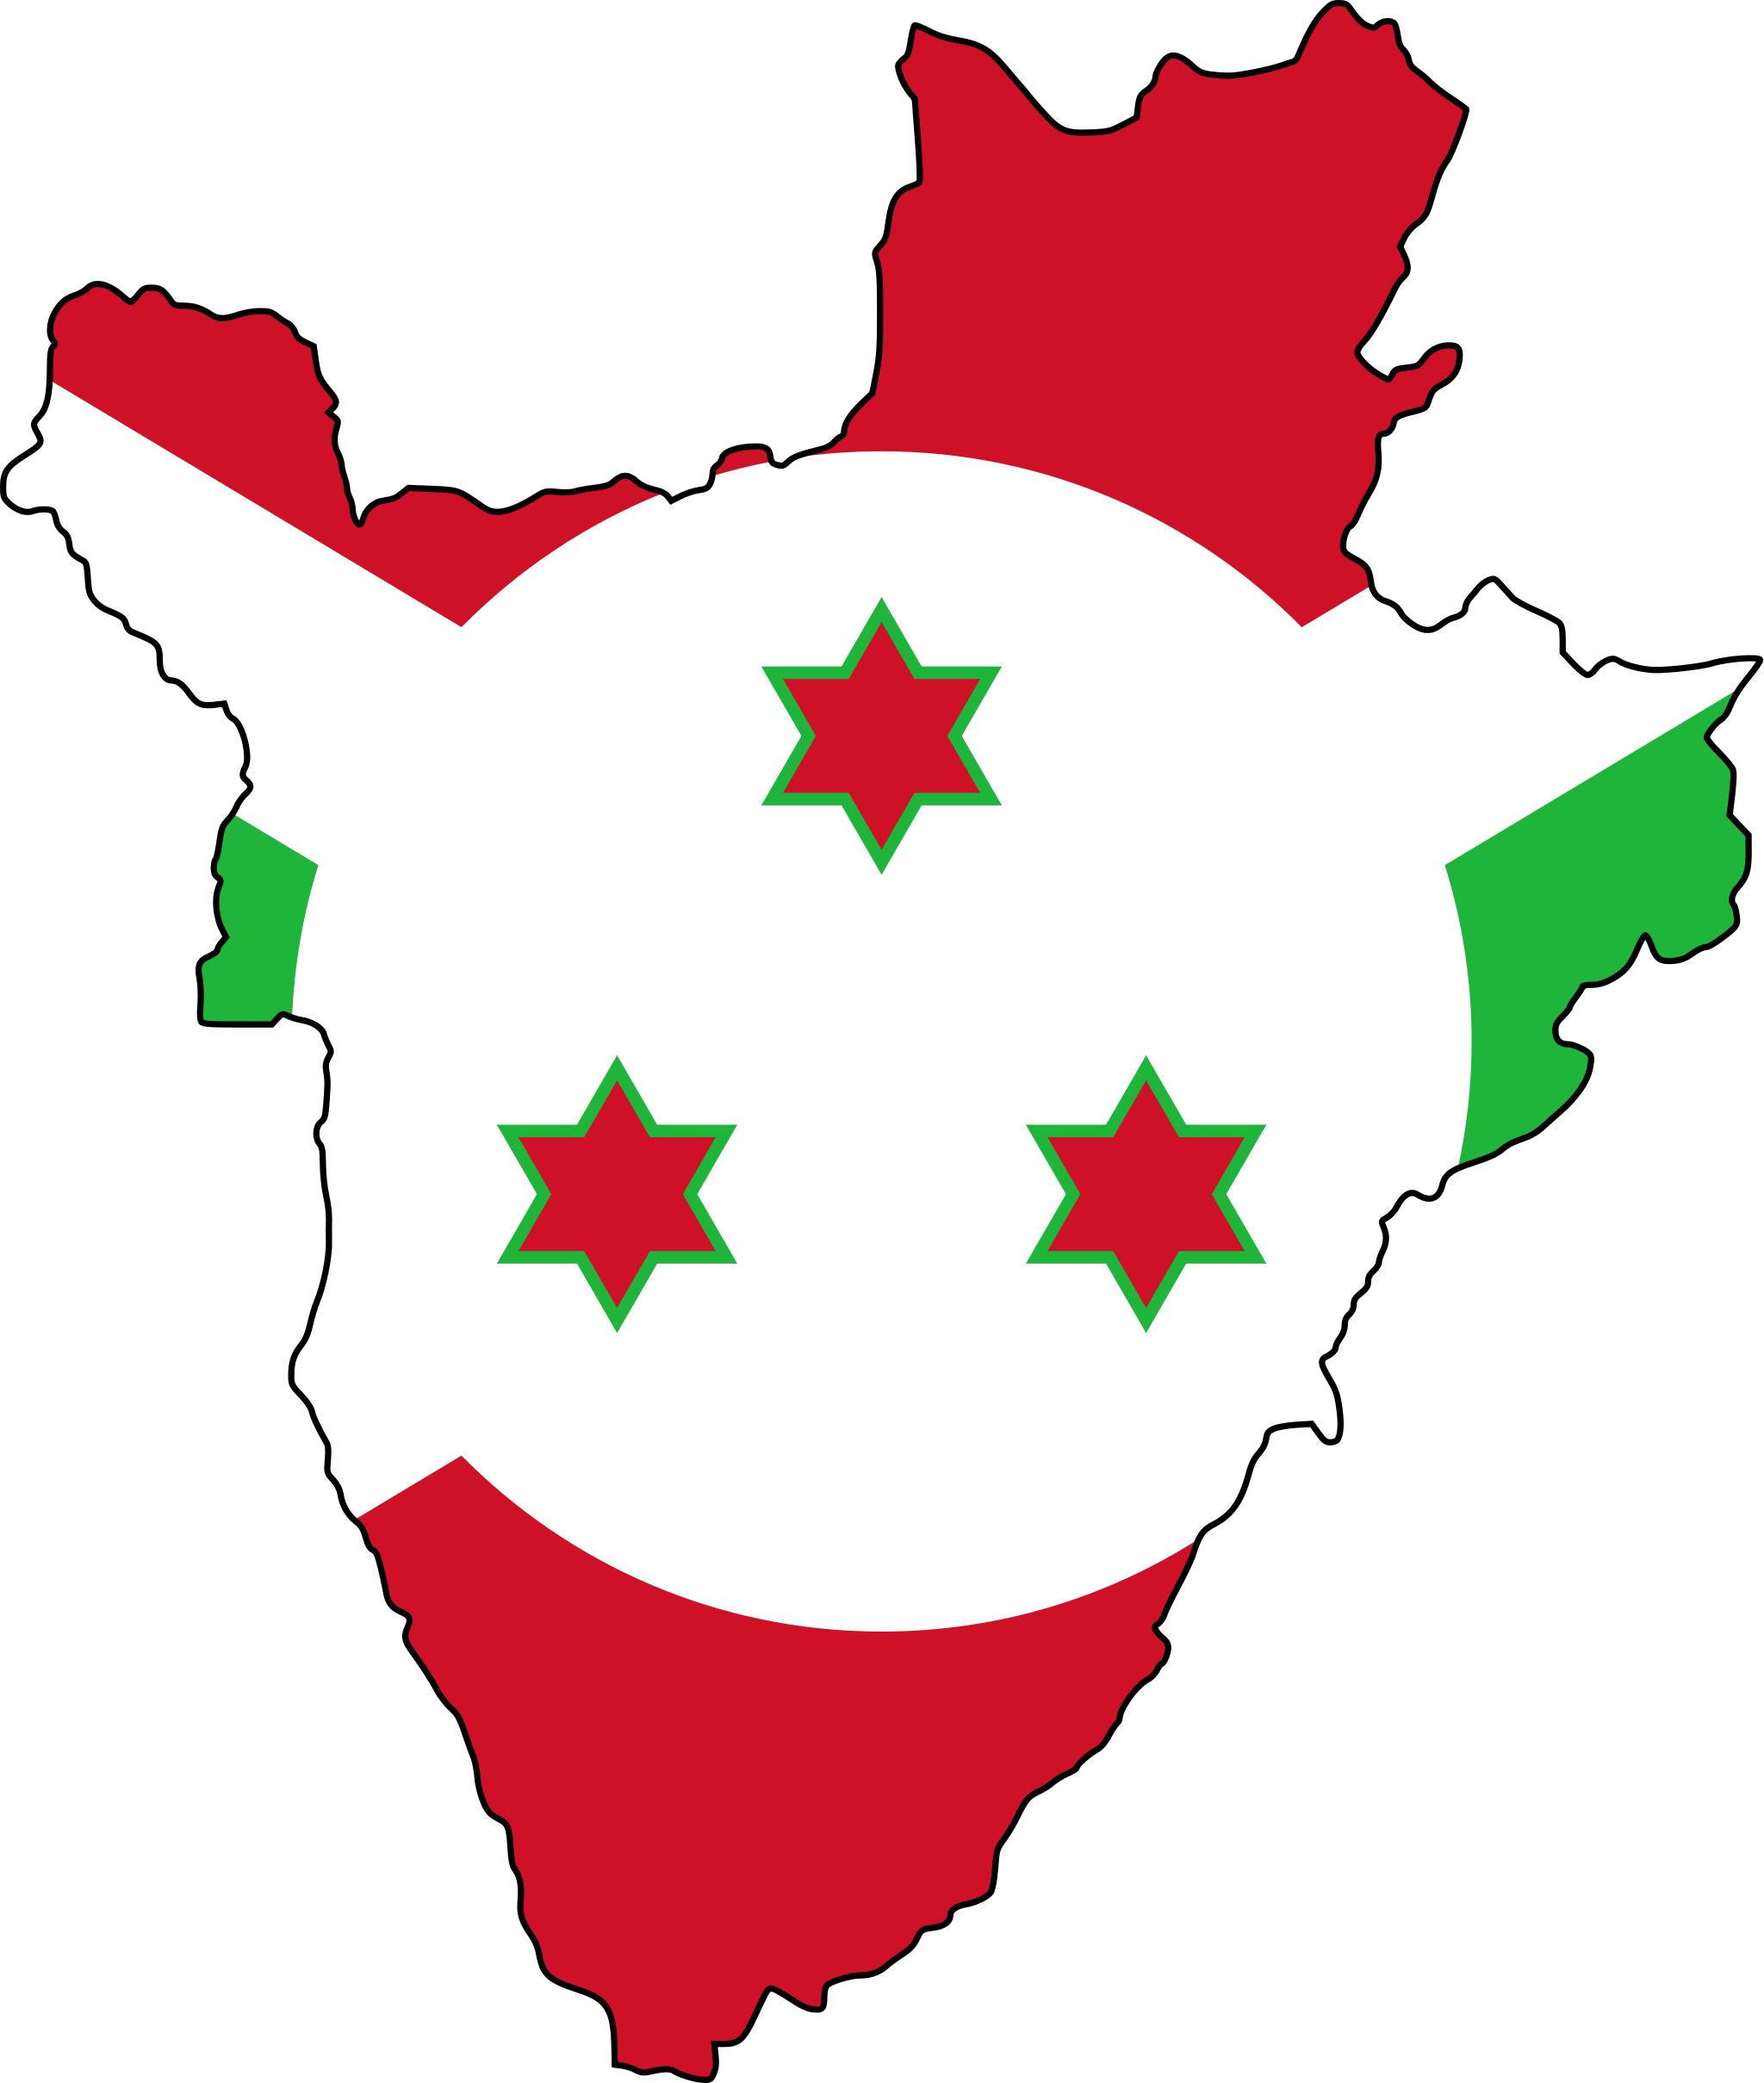 Burundi Flag Map Geogeek Pinterest Flags and Africa